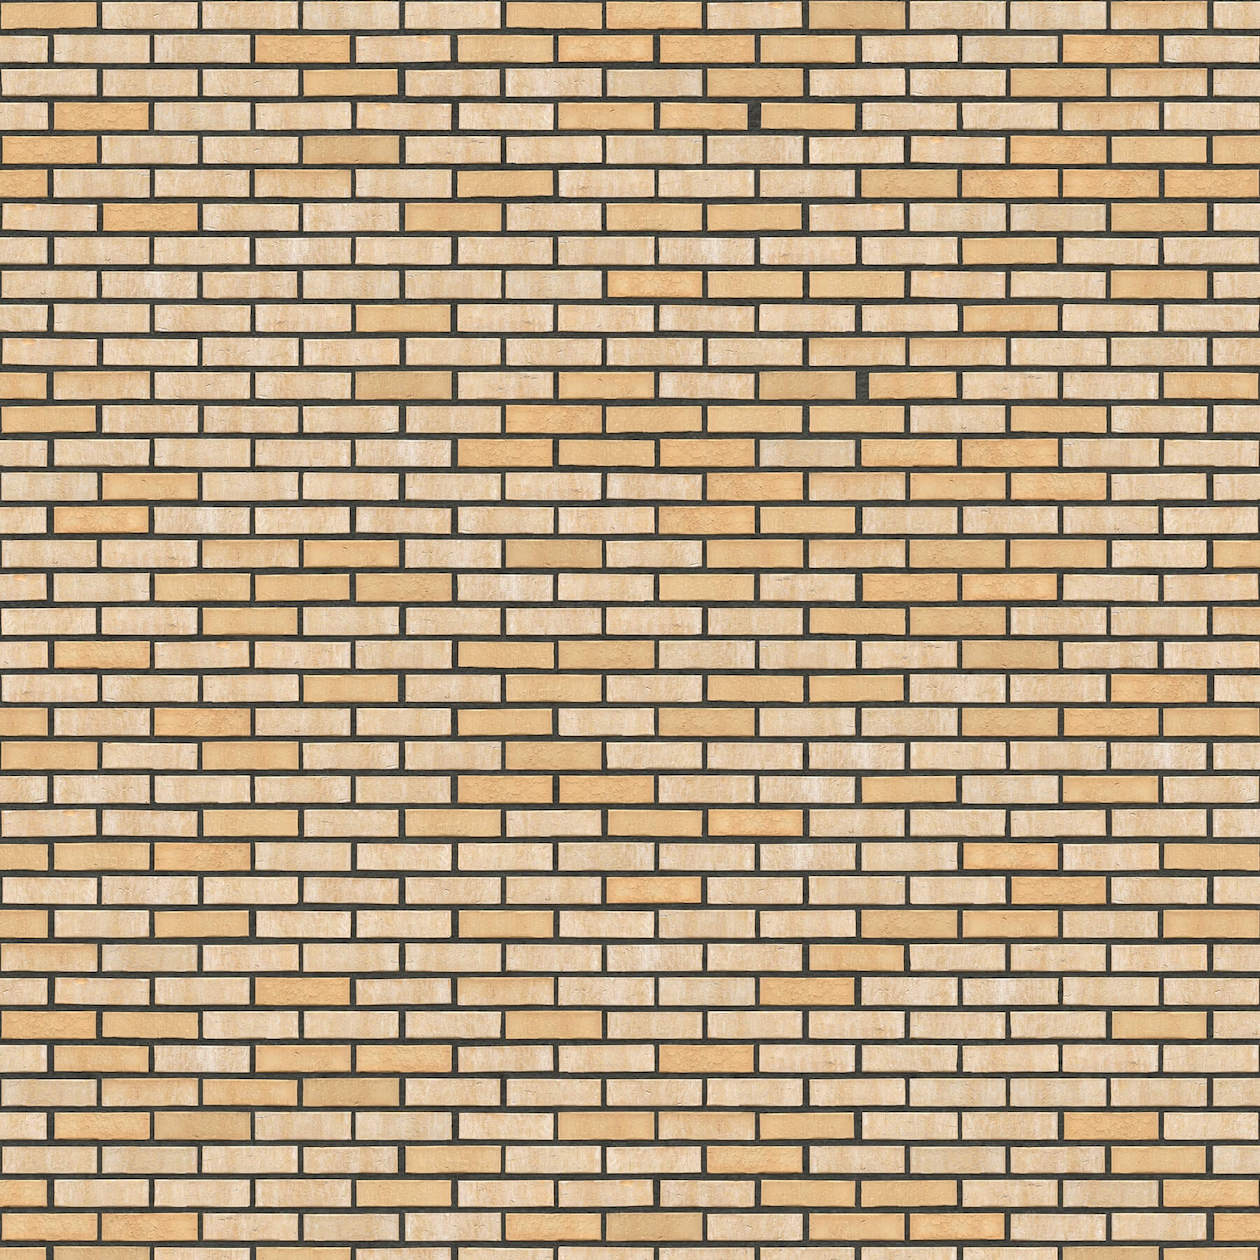 Puna-cigla-FeldHaus-Klinker-brick-house-nf-k-741-Antracit Fuga